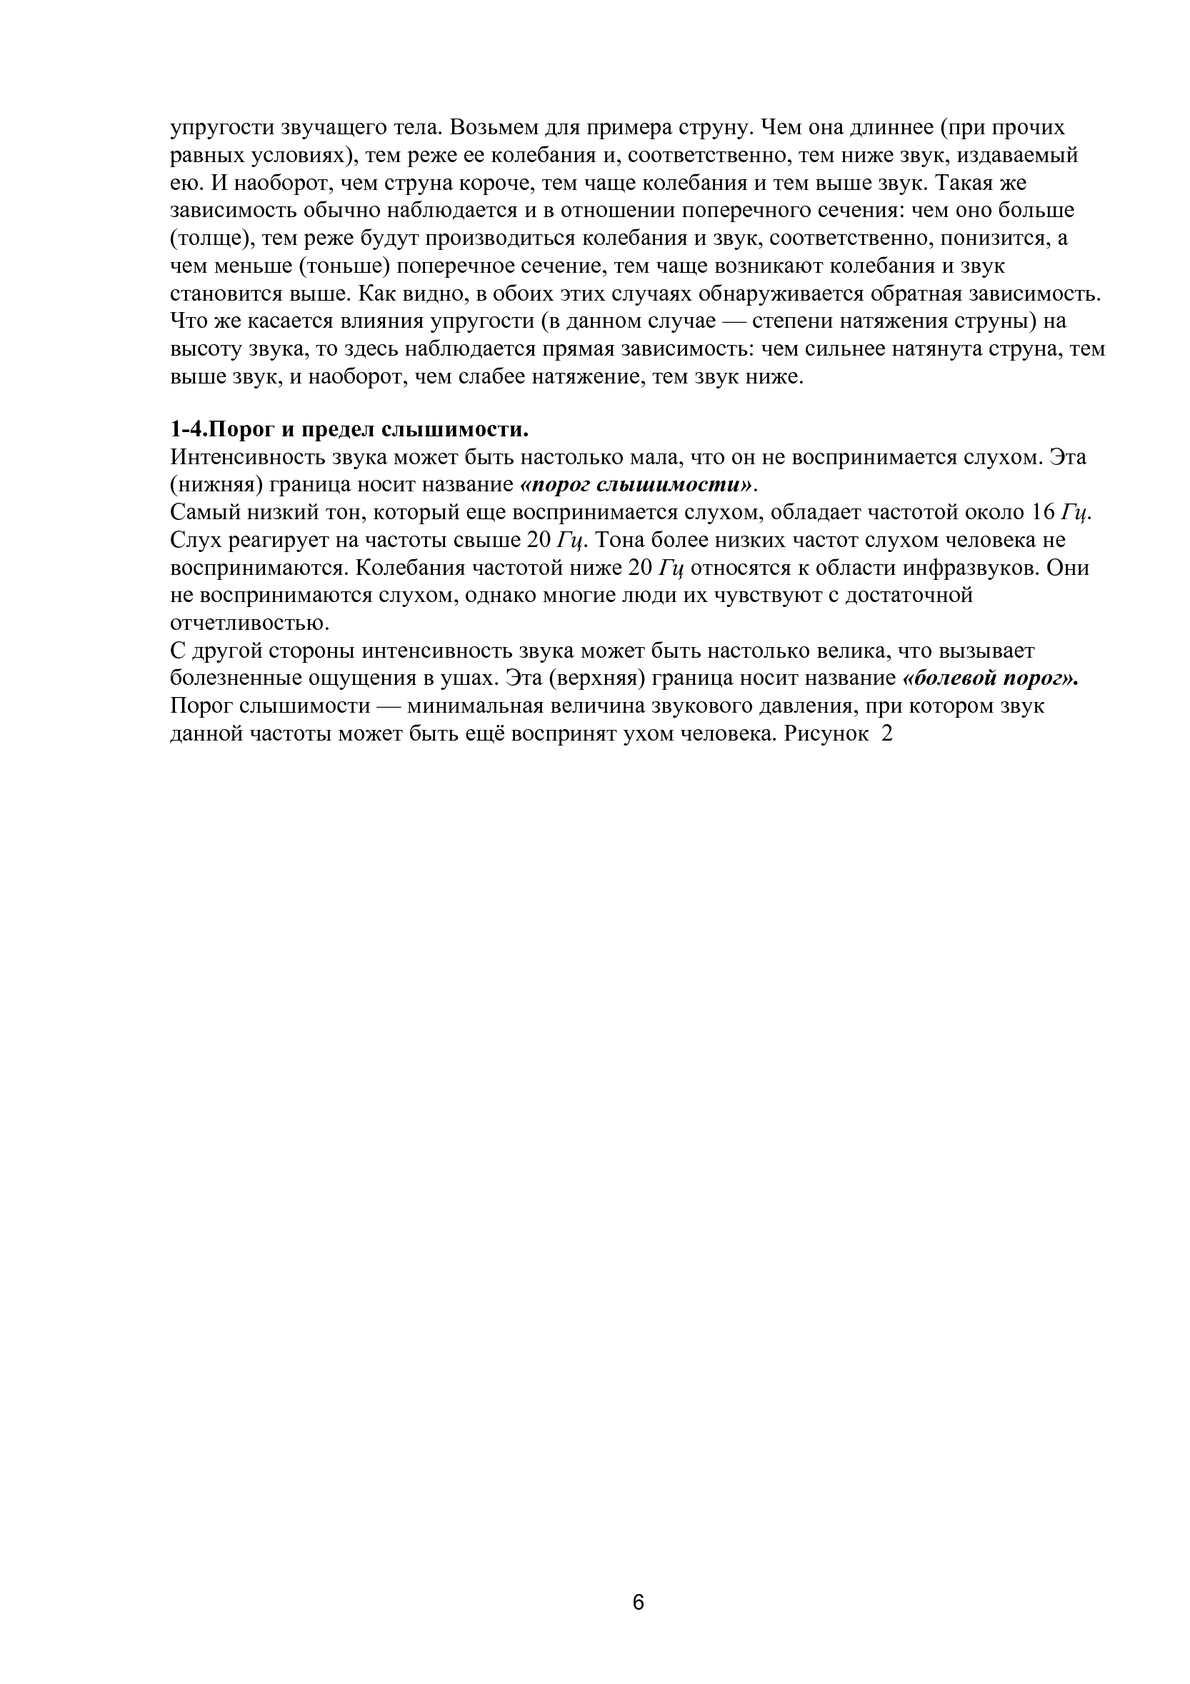 Реферат Звук и его влияние на человека calameo er page 6